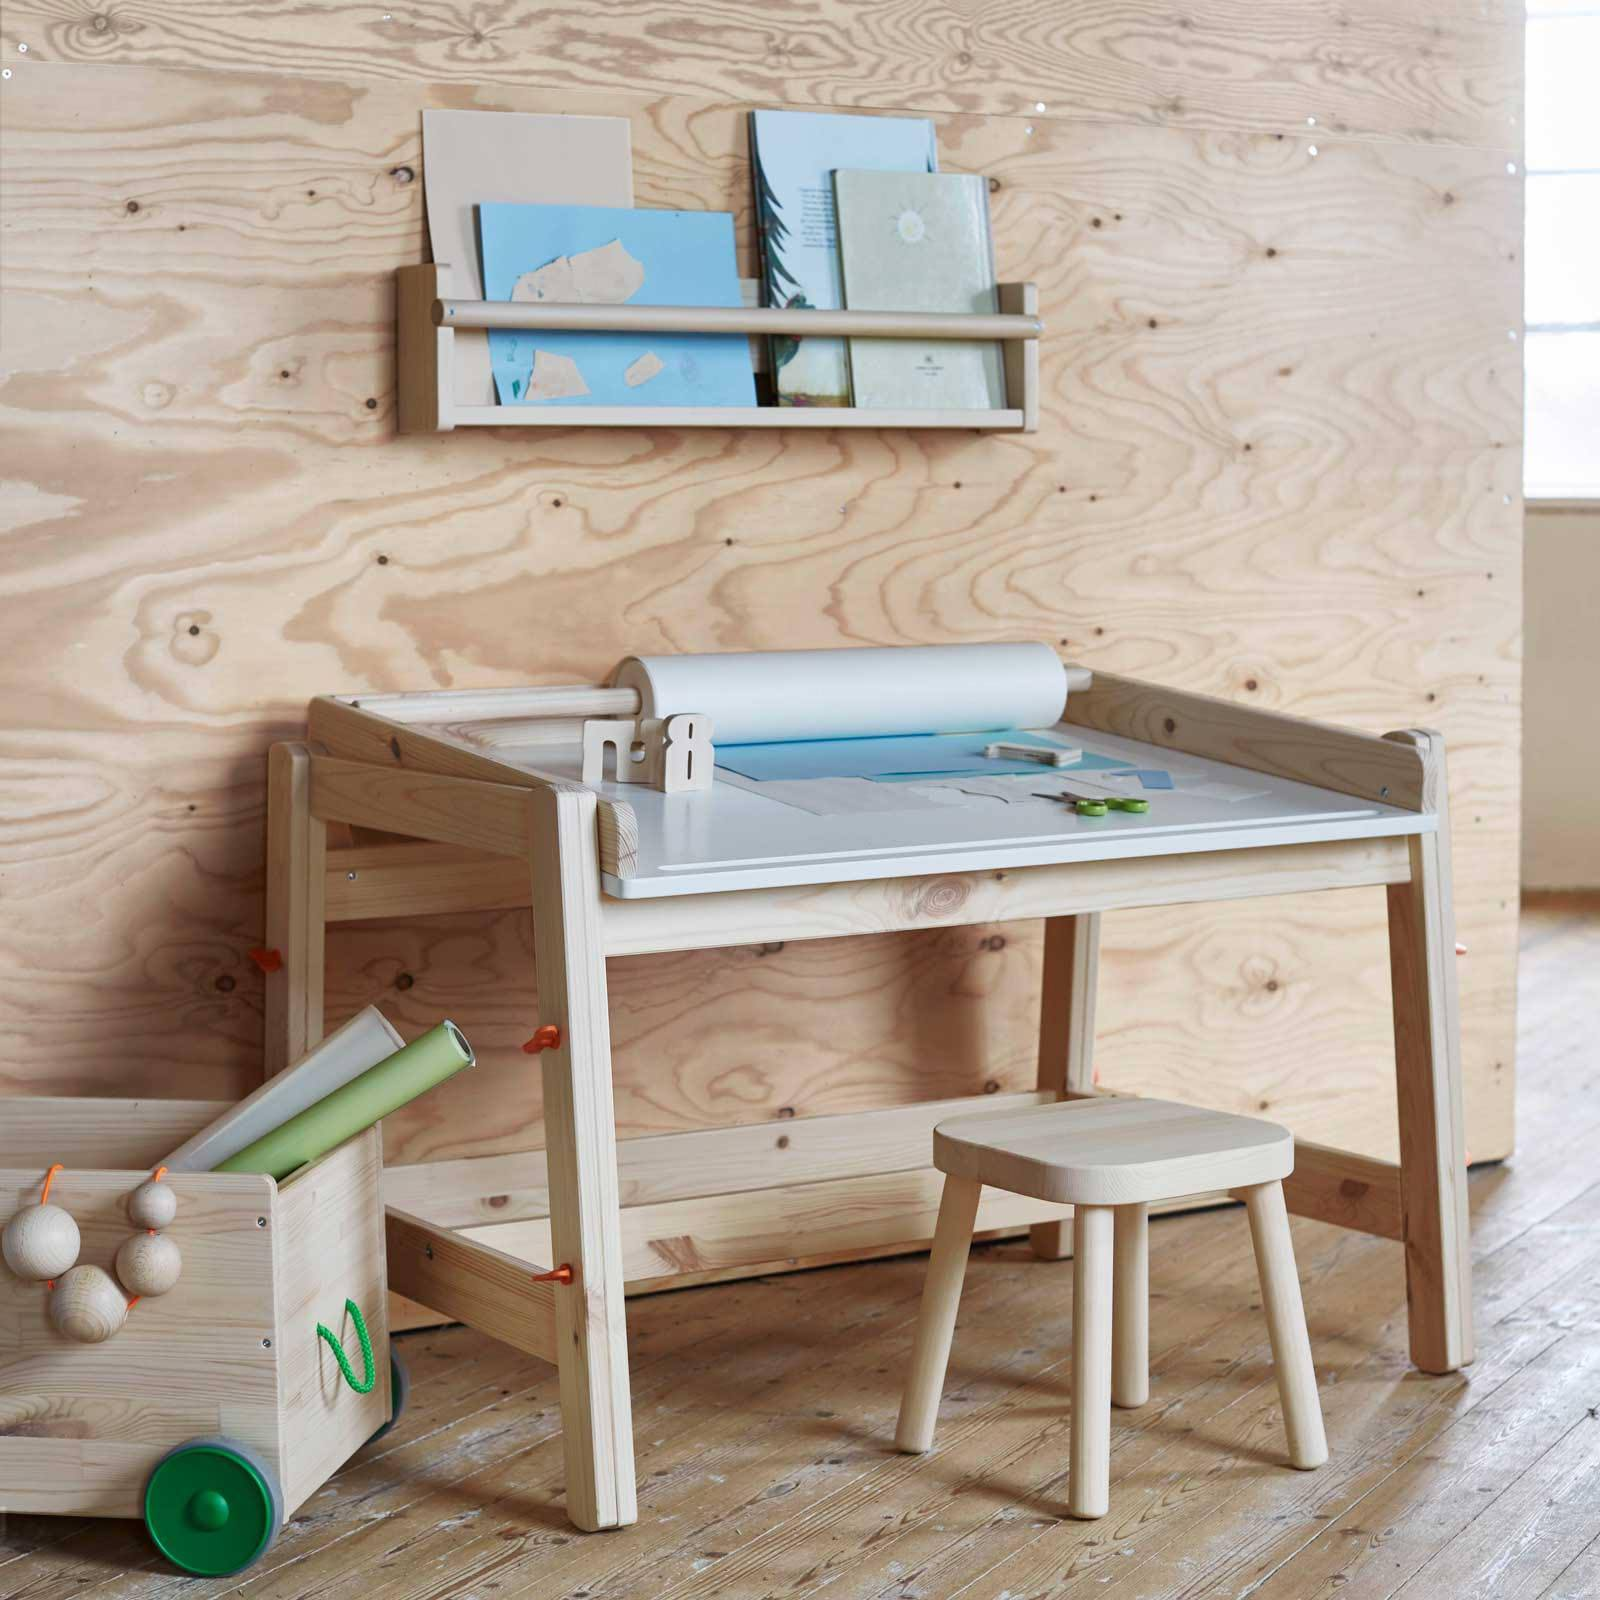 nieuwe kindermeubels bij ikea maison belle. Black Bedroom Furniture Sets. Home Design Ideas